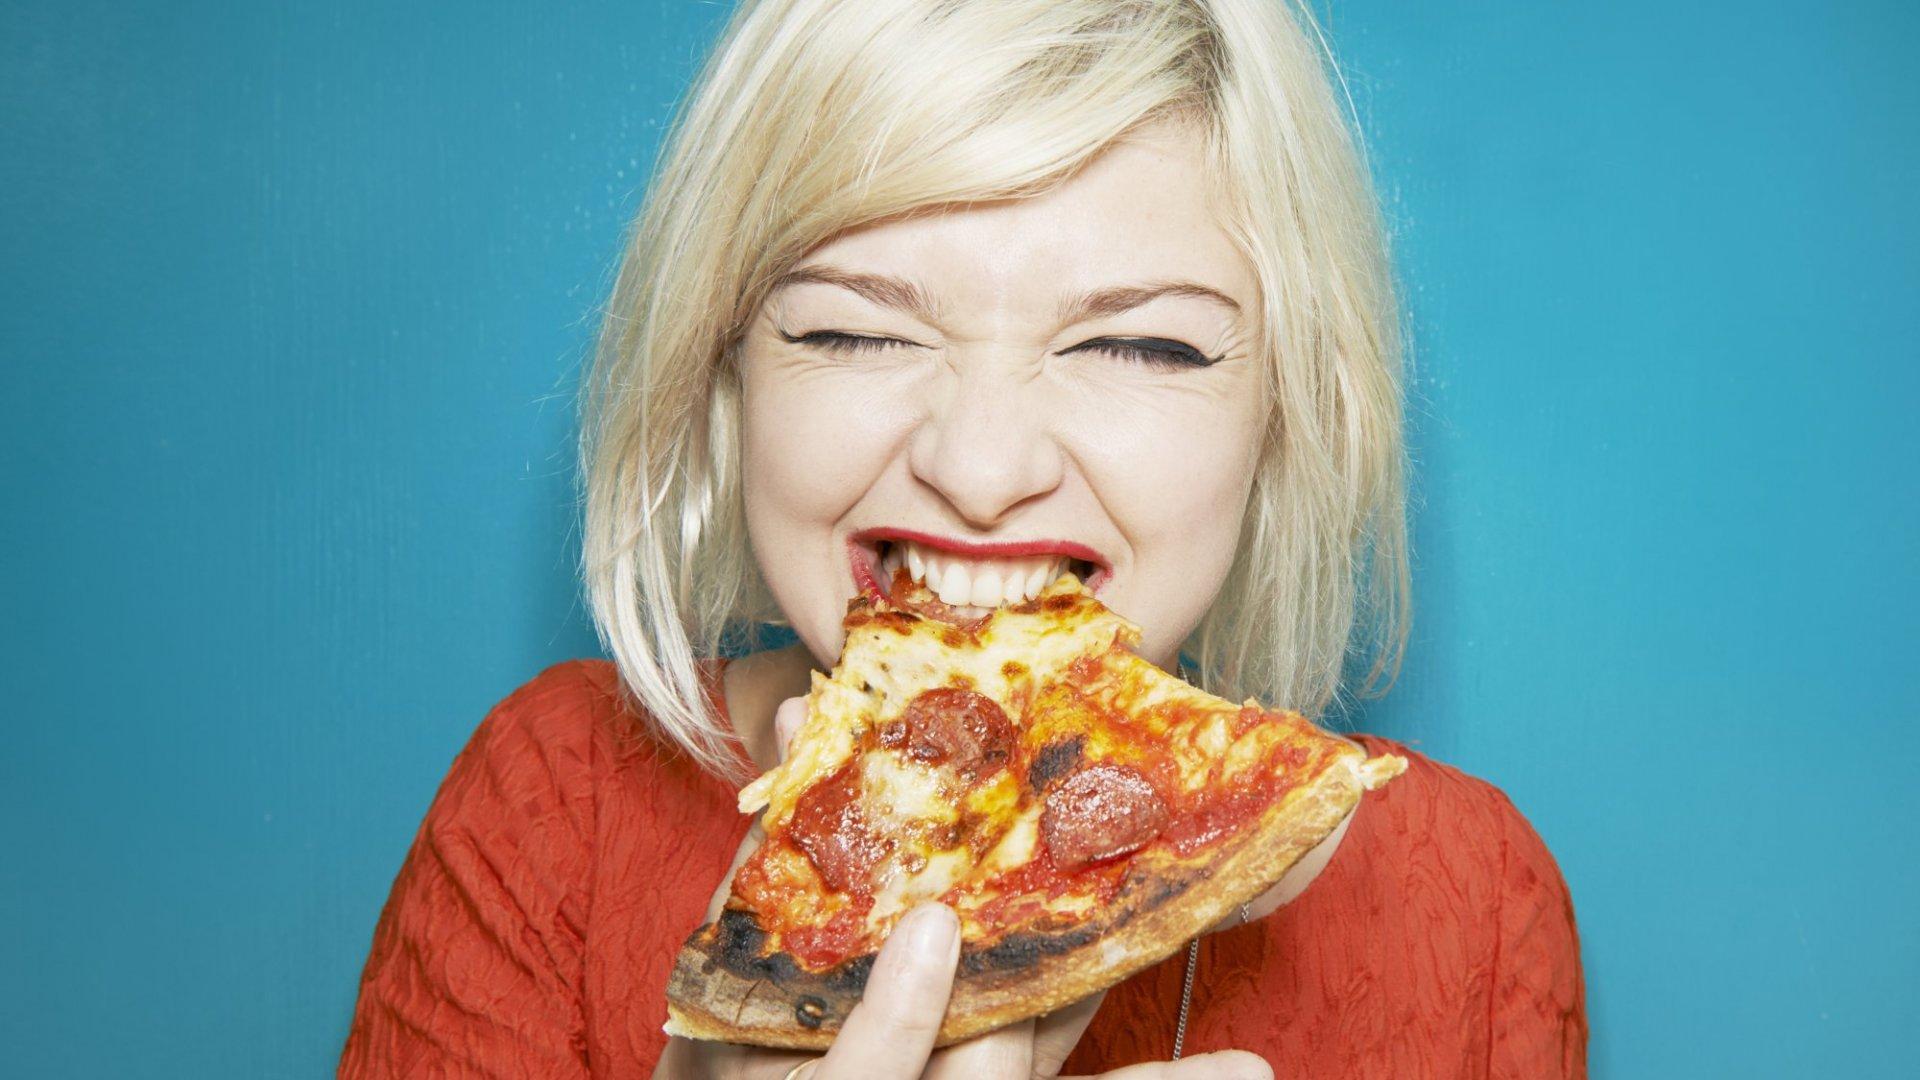 Behavioral Economics Explains Why People Love Pizza